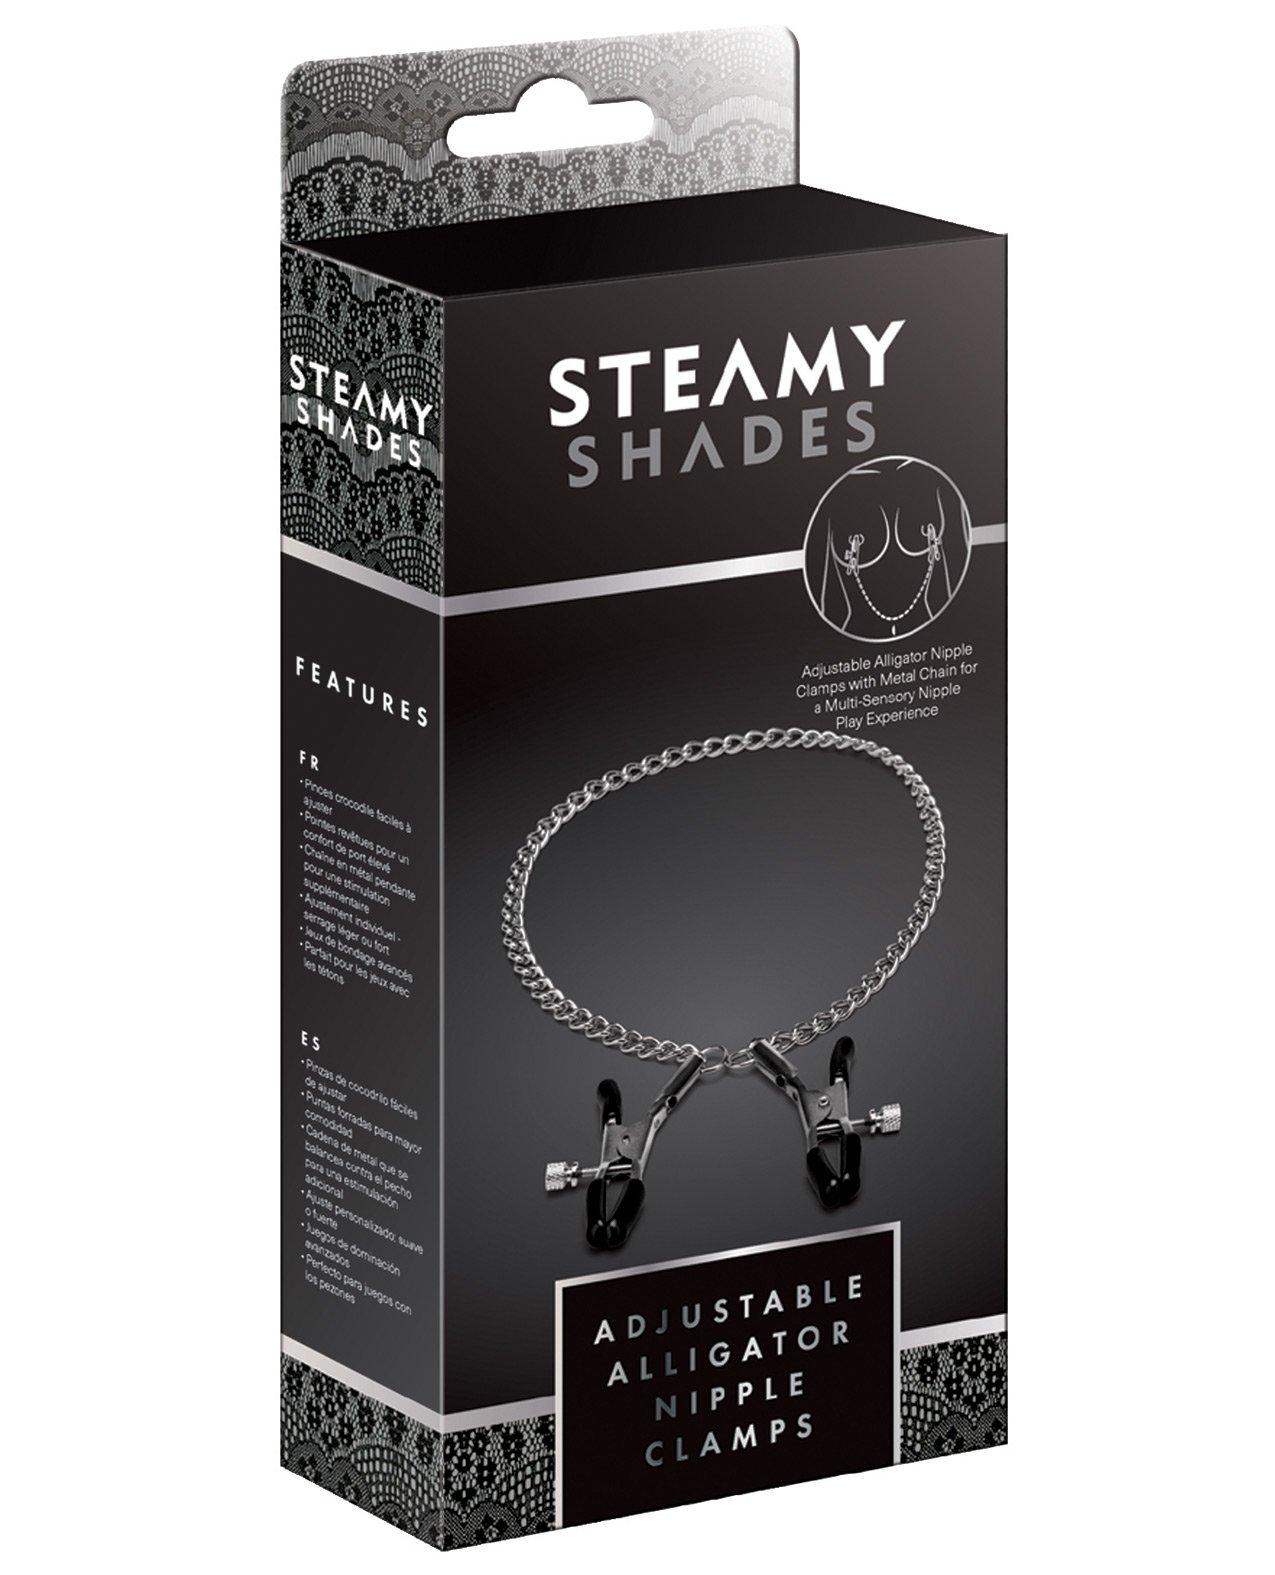 Steamy Shades Adjustable Alligator Nipple Clamps